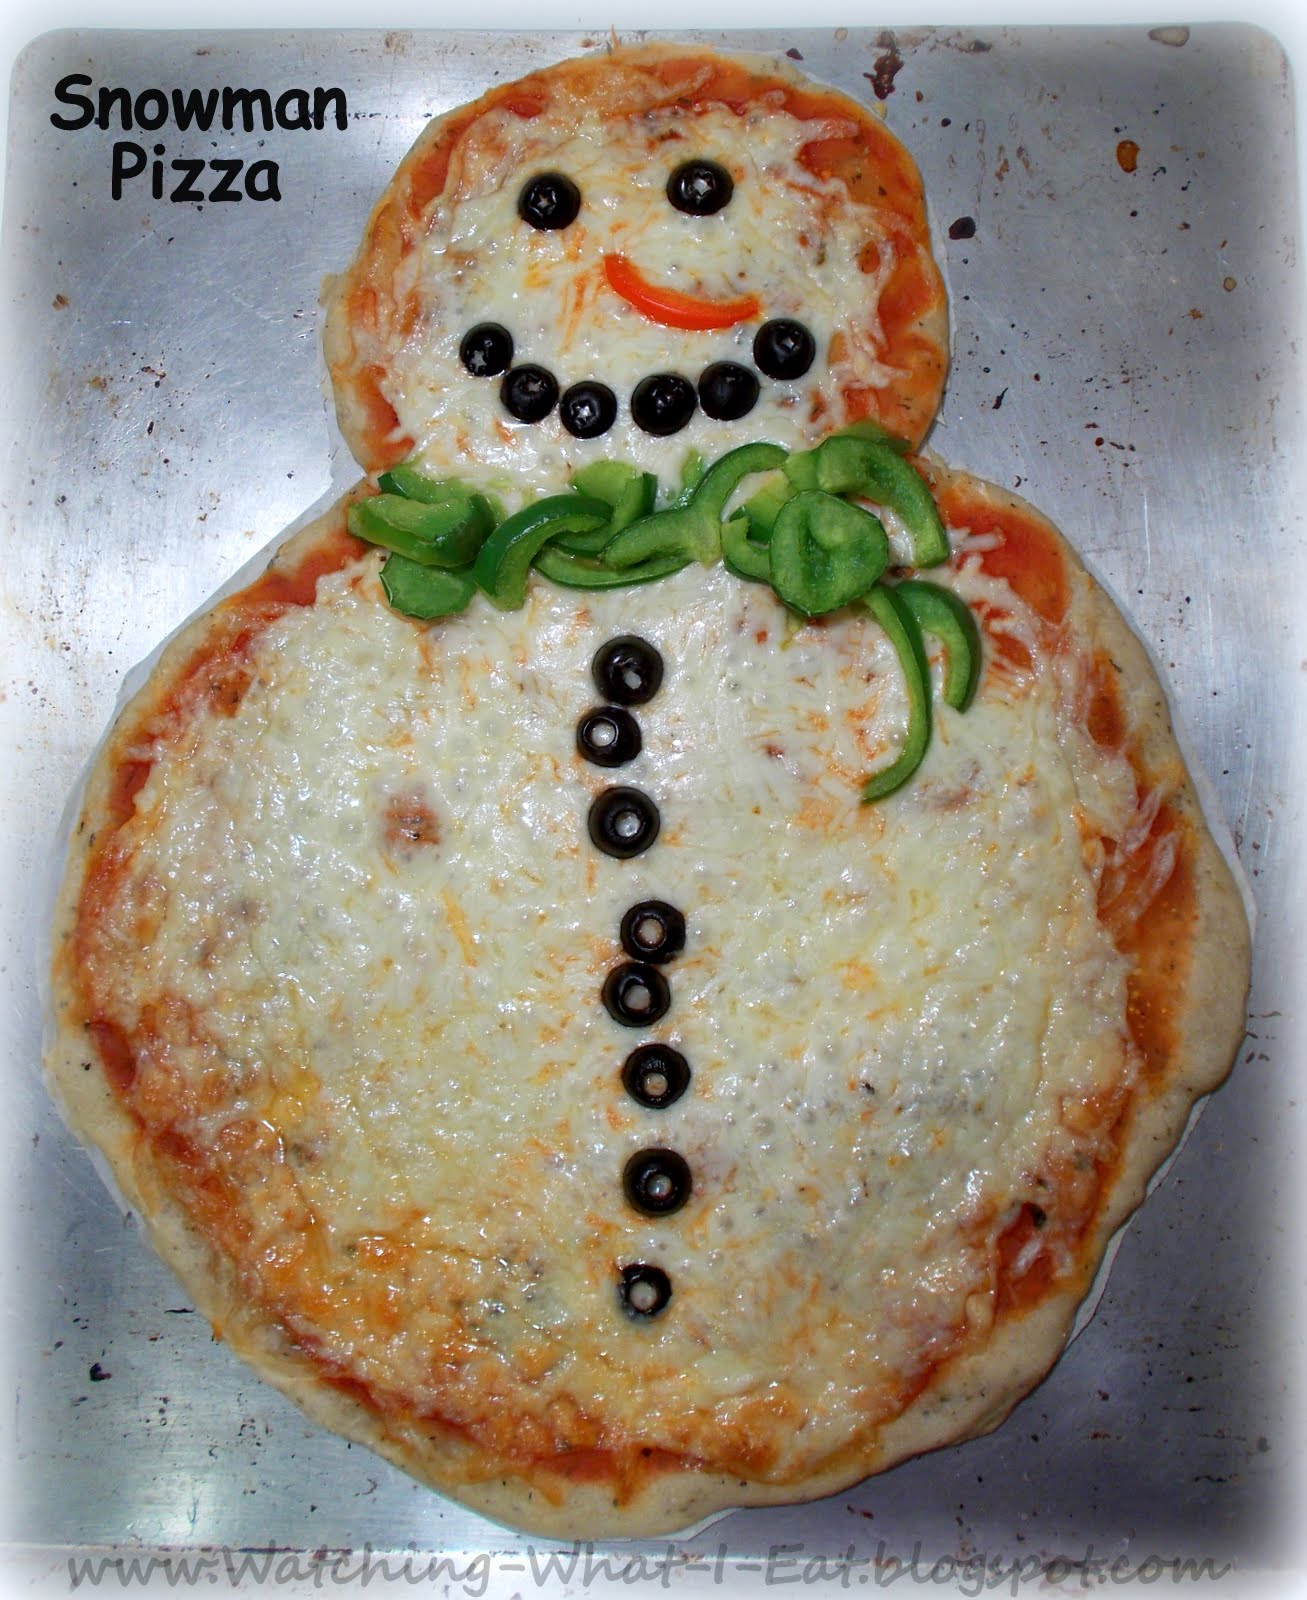 snowman+pizza4.JPG